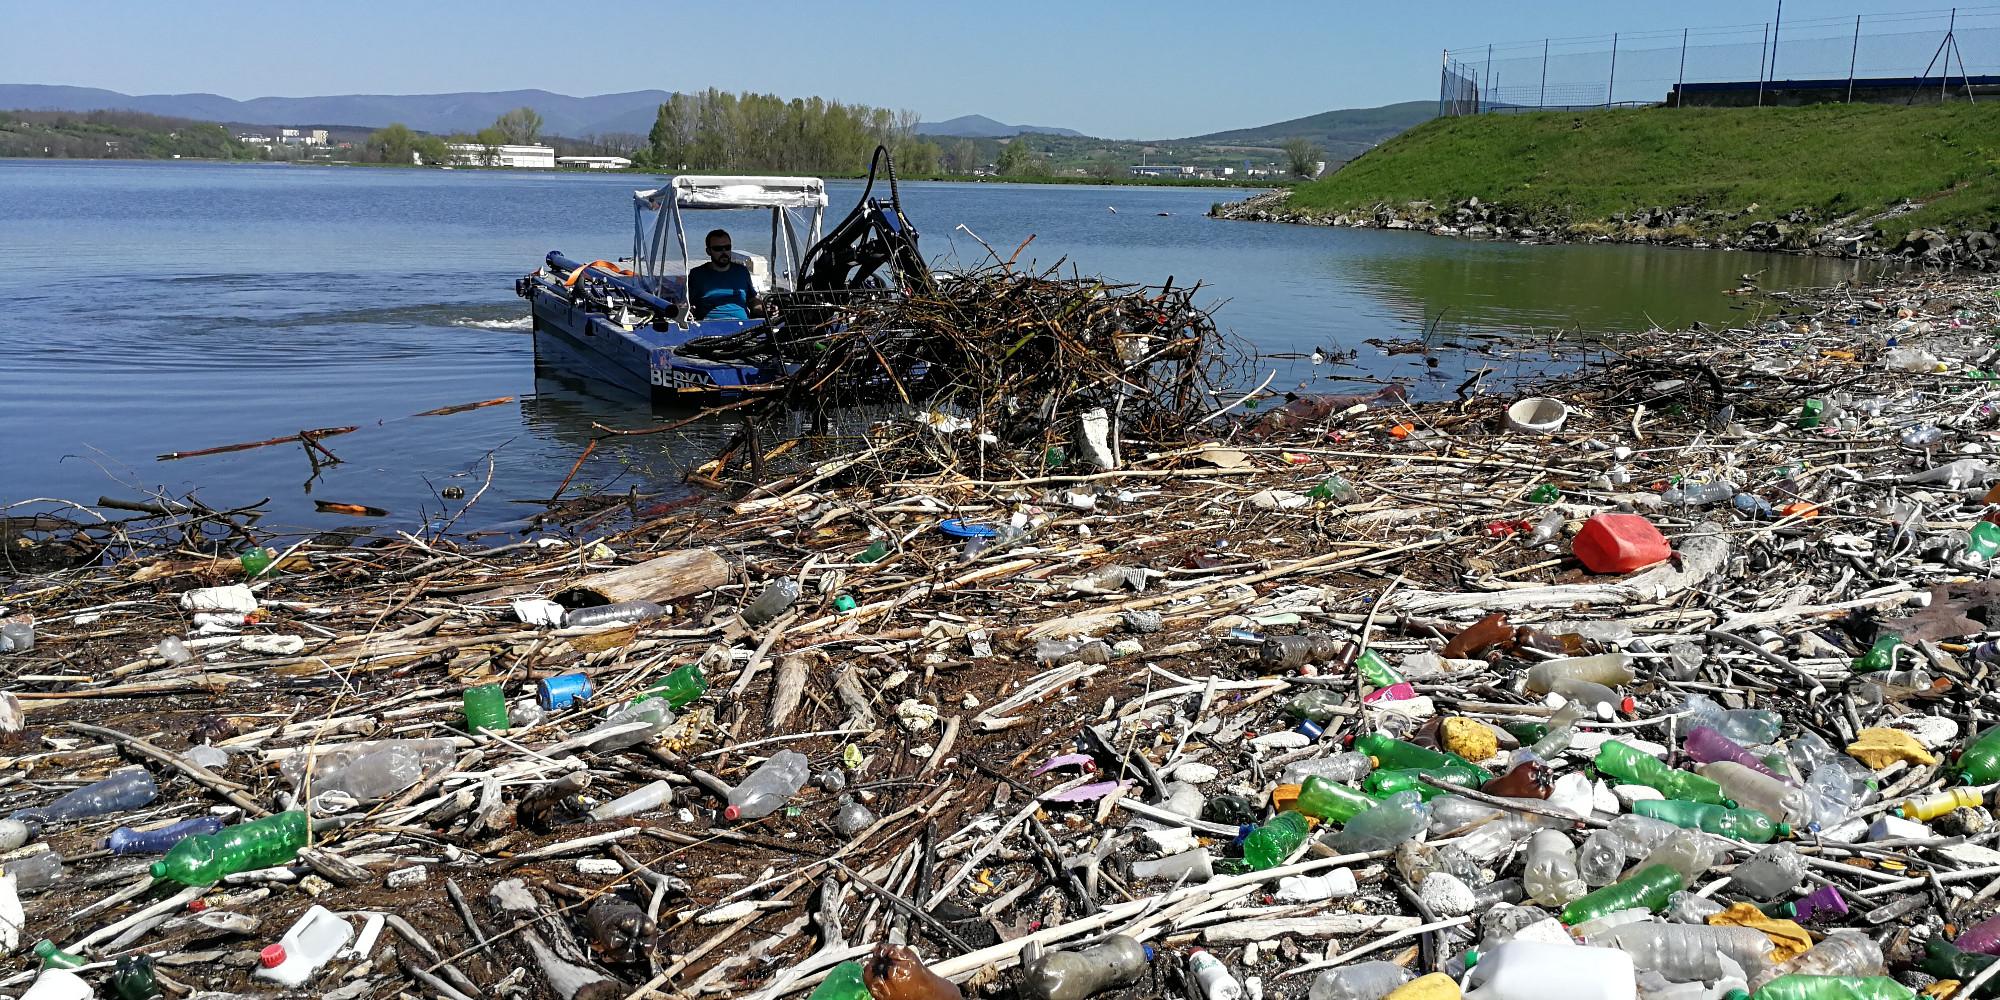 Bager Laborec, dredger, suction dredger, Laborec, dredging, mowing, kosenie jazier, kosenie nedostupných miest, kosenie bagrom, čisté jazero, čistenie jazier, zber odpadu, waste collection